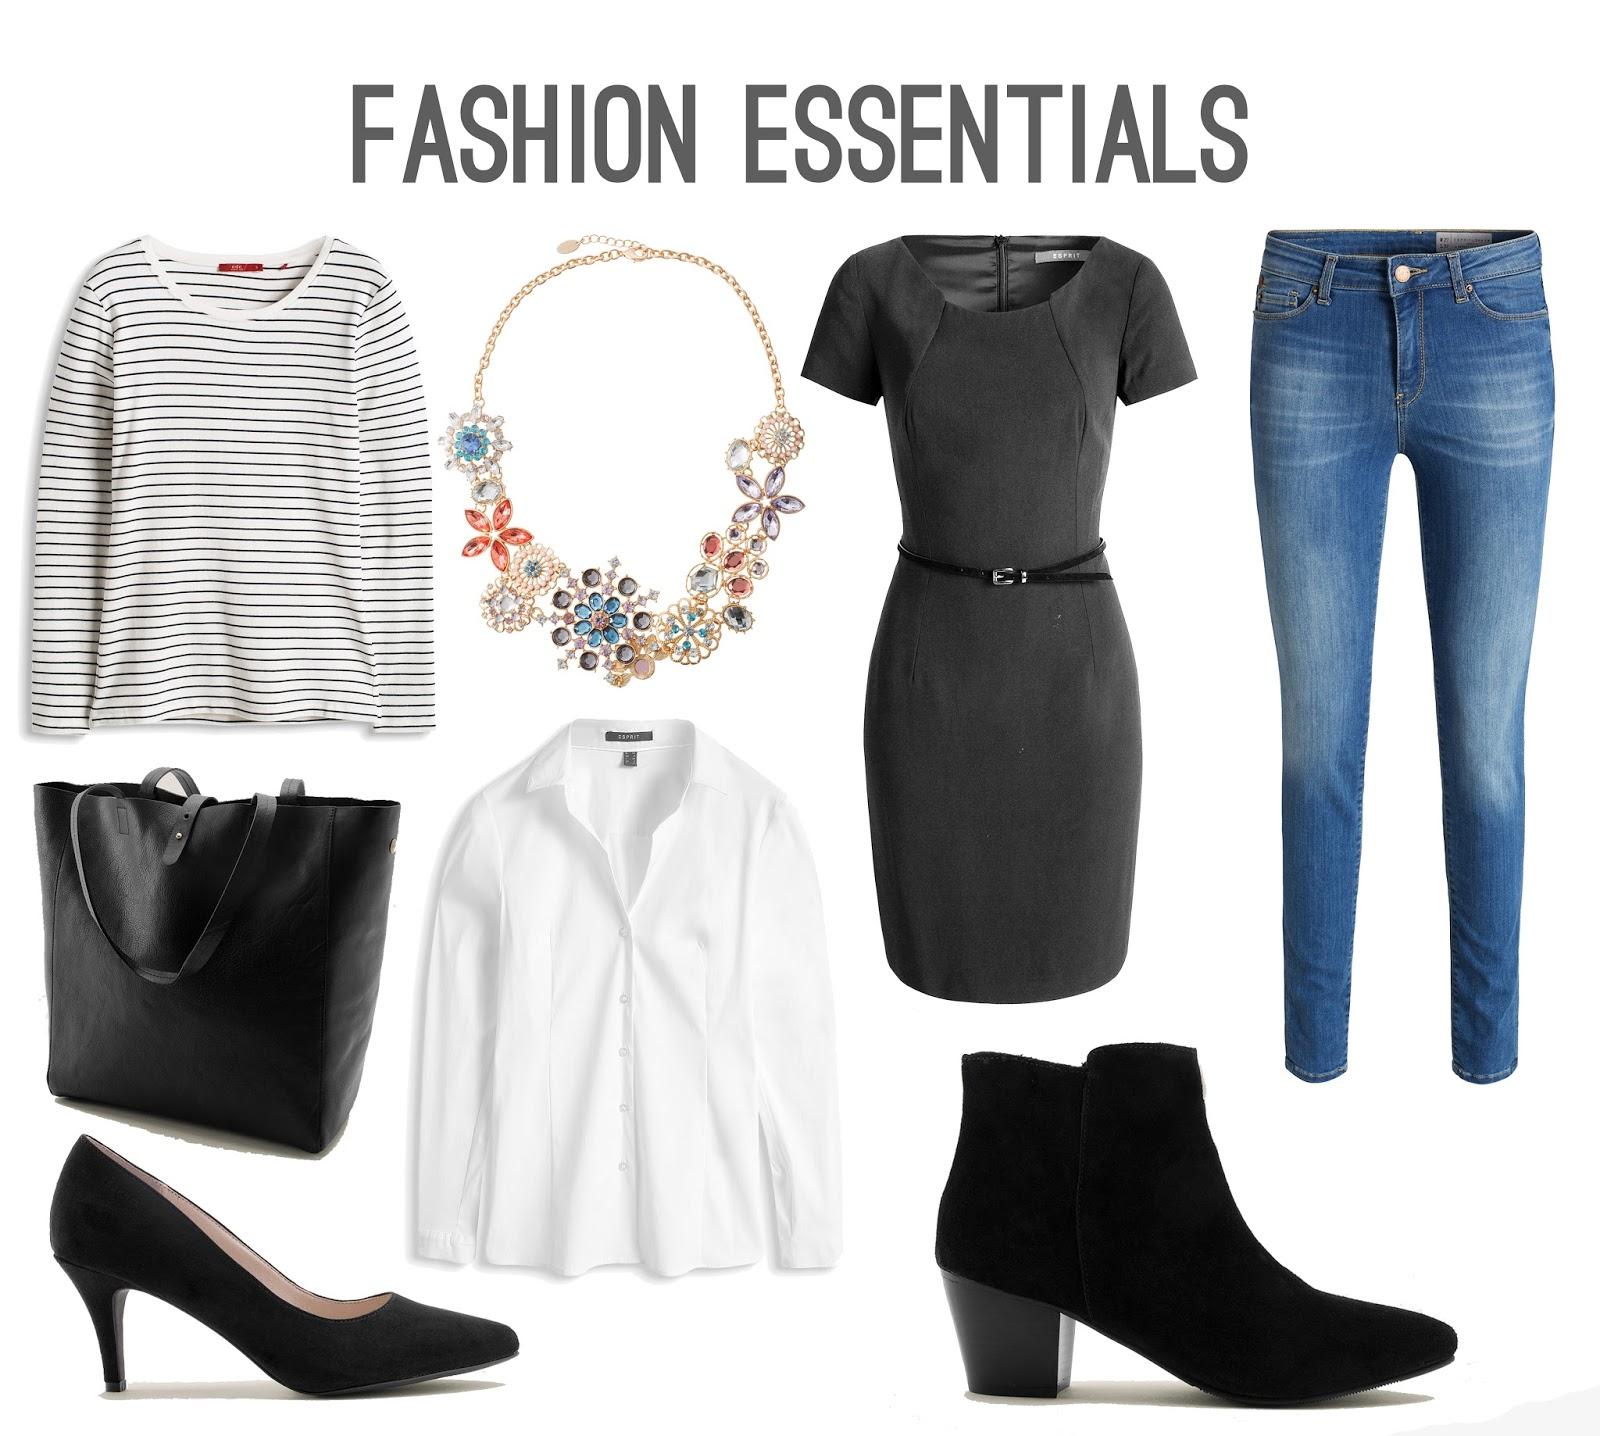 List of fashion items 85